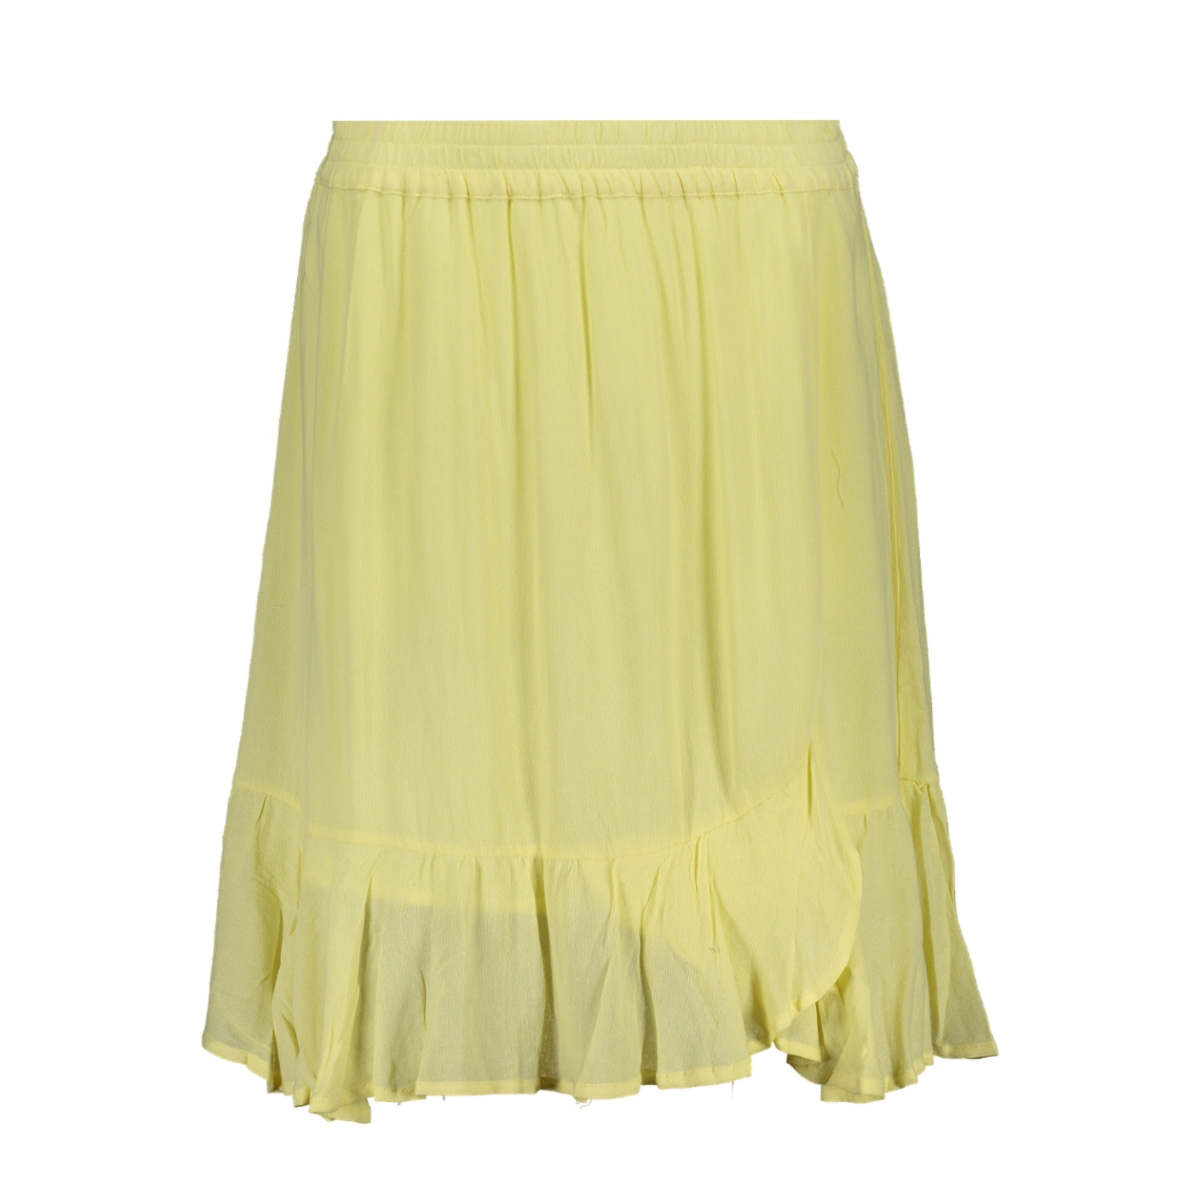 woven skirt above on knee t8018 saint tropez rok 2041 yellow